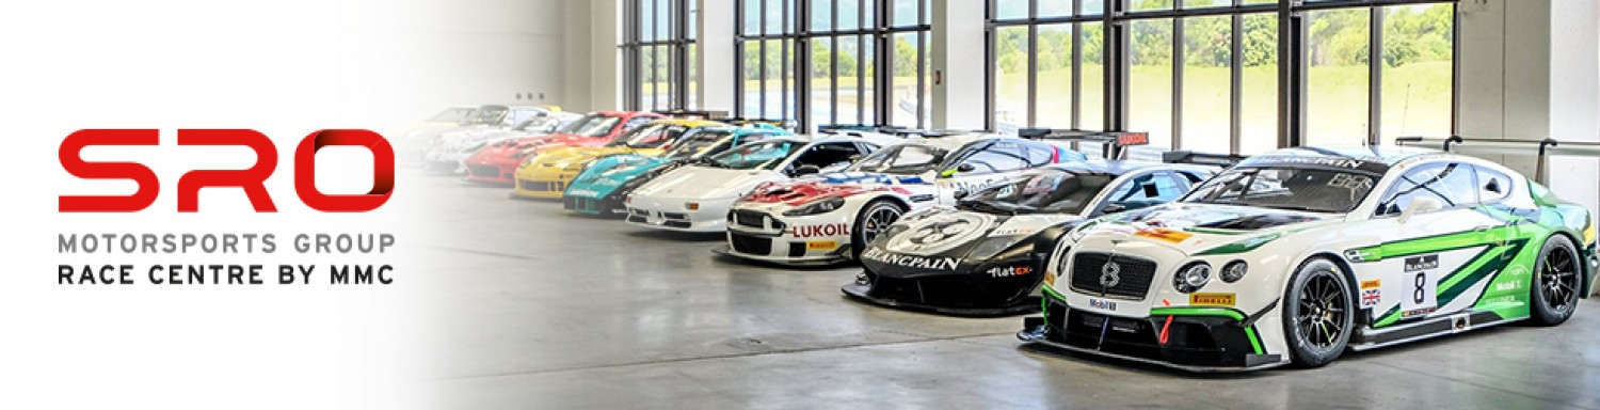 SRO Race Centre by MMC Image